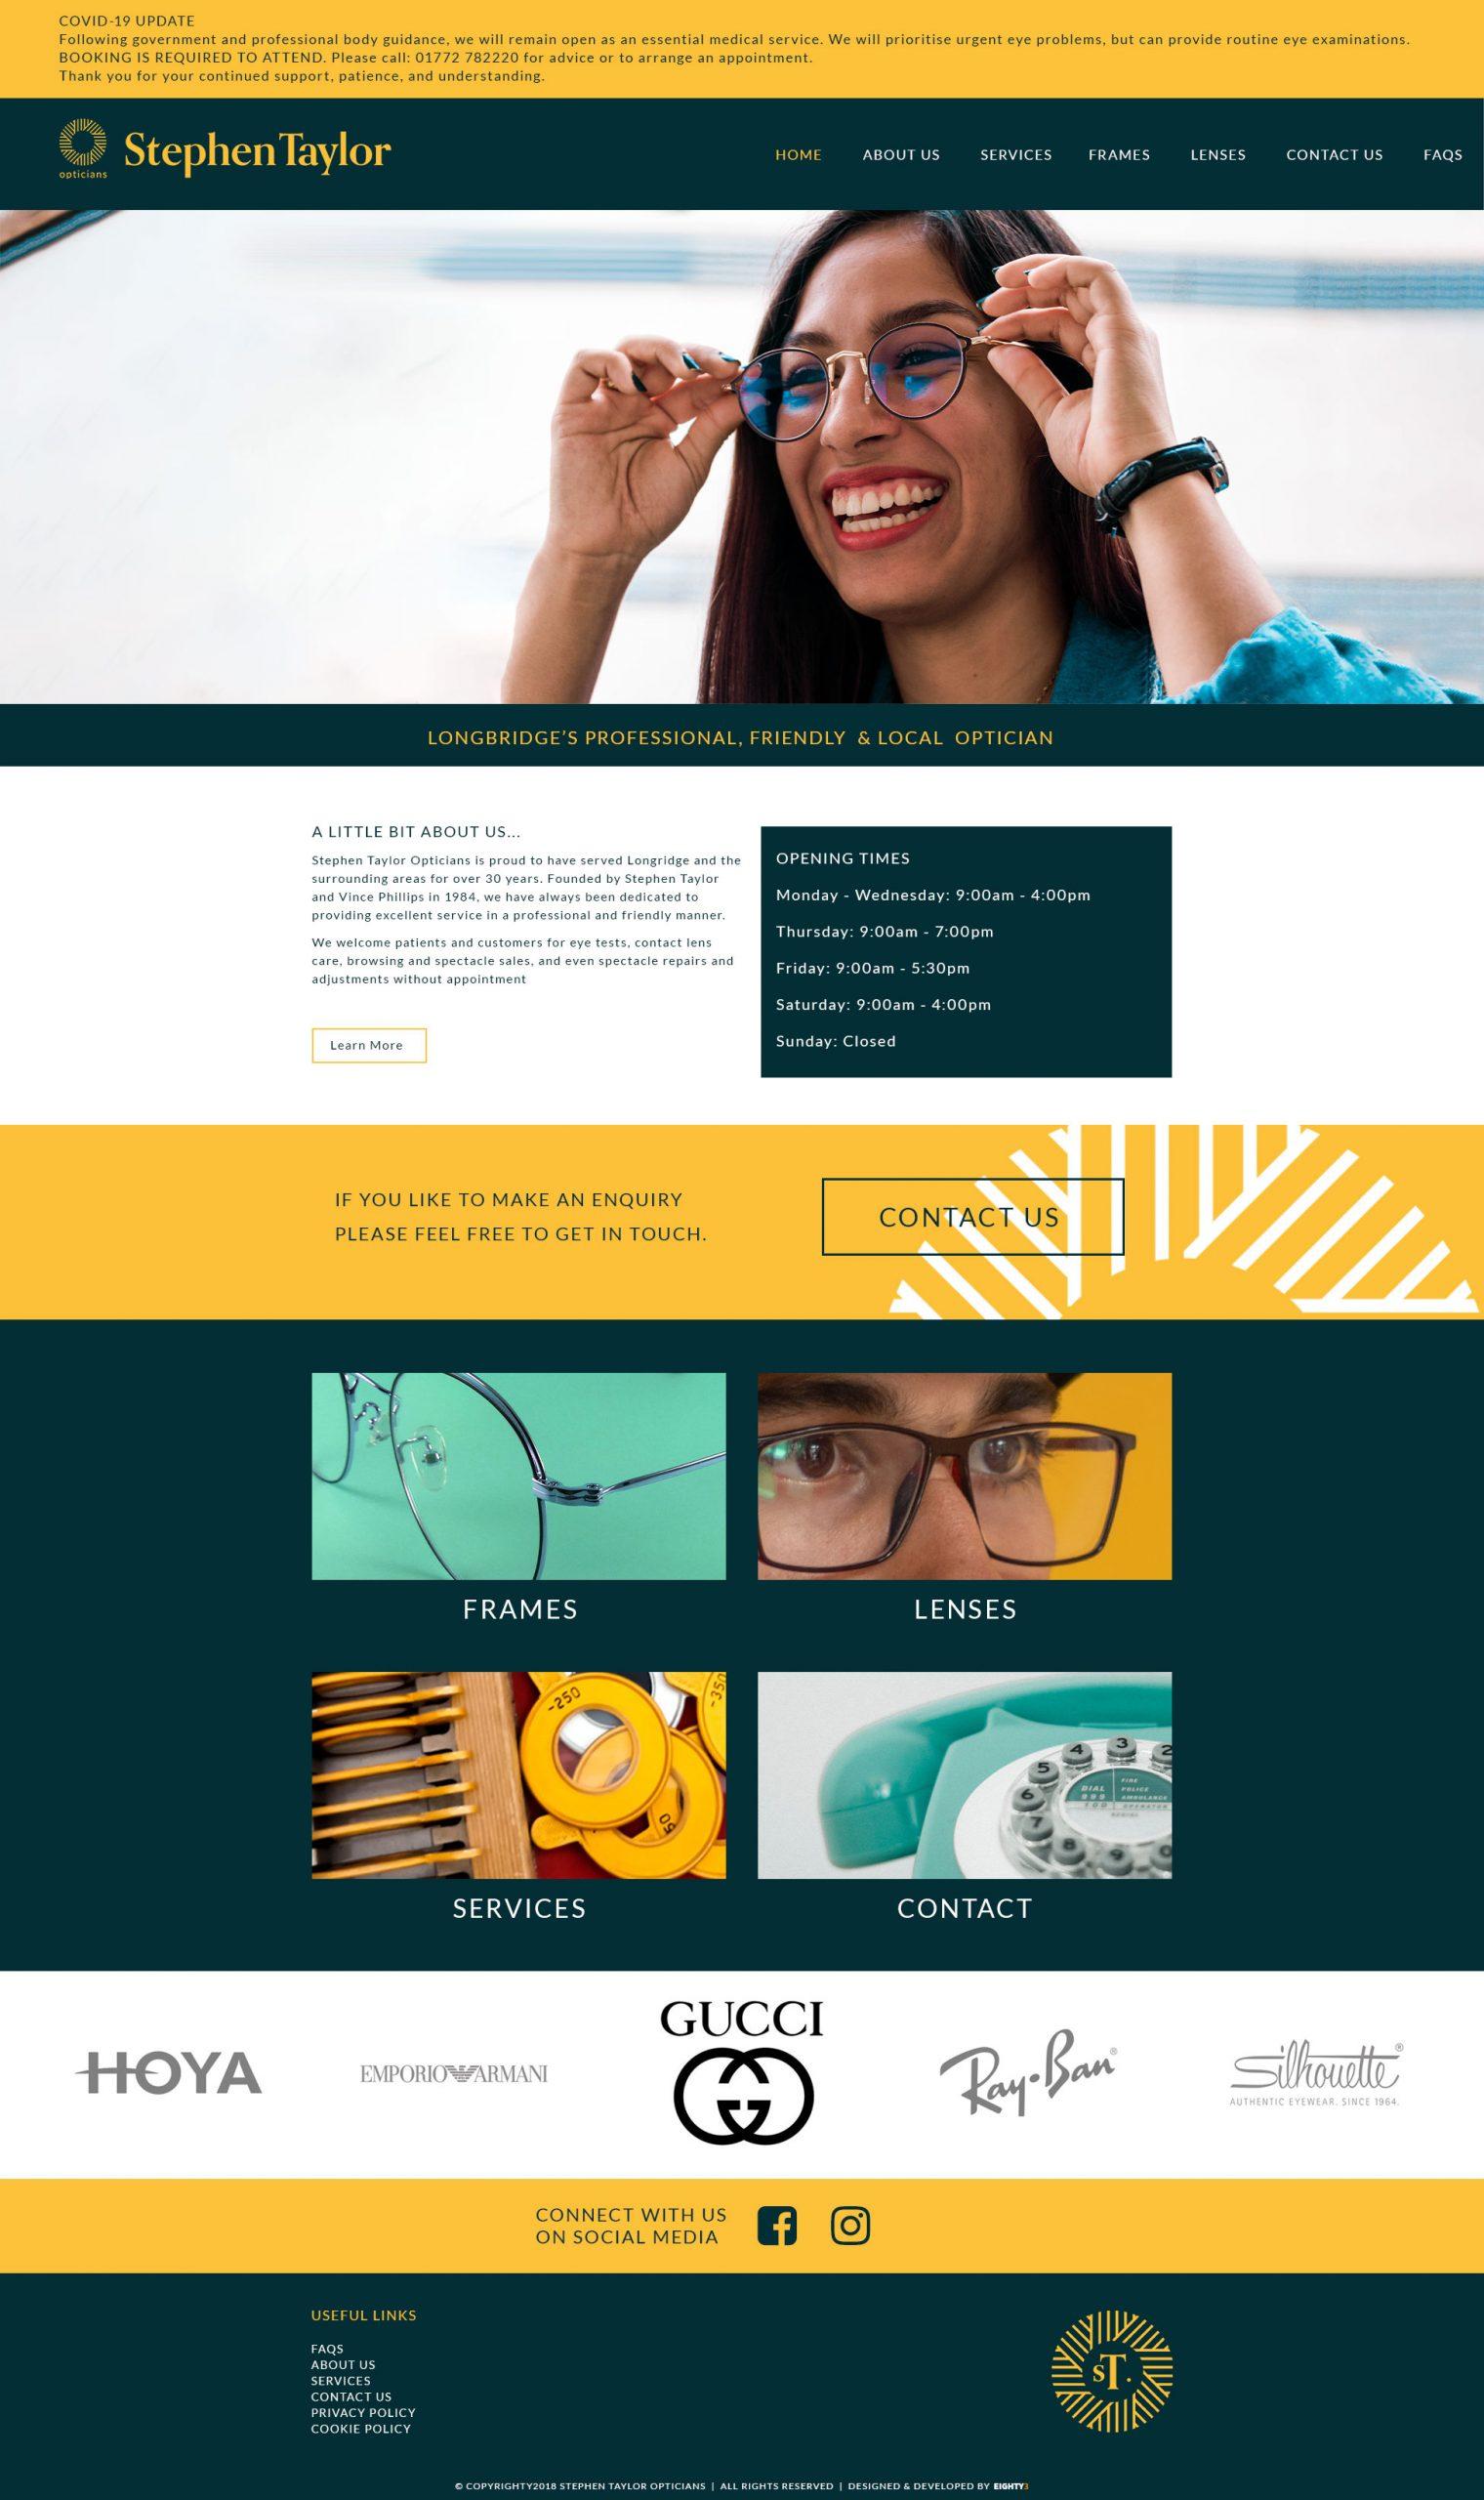 Stephen Taylor Opticians - Website Refresh